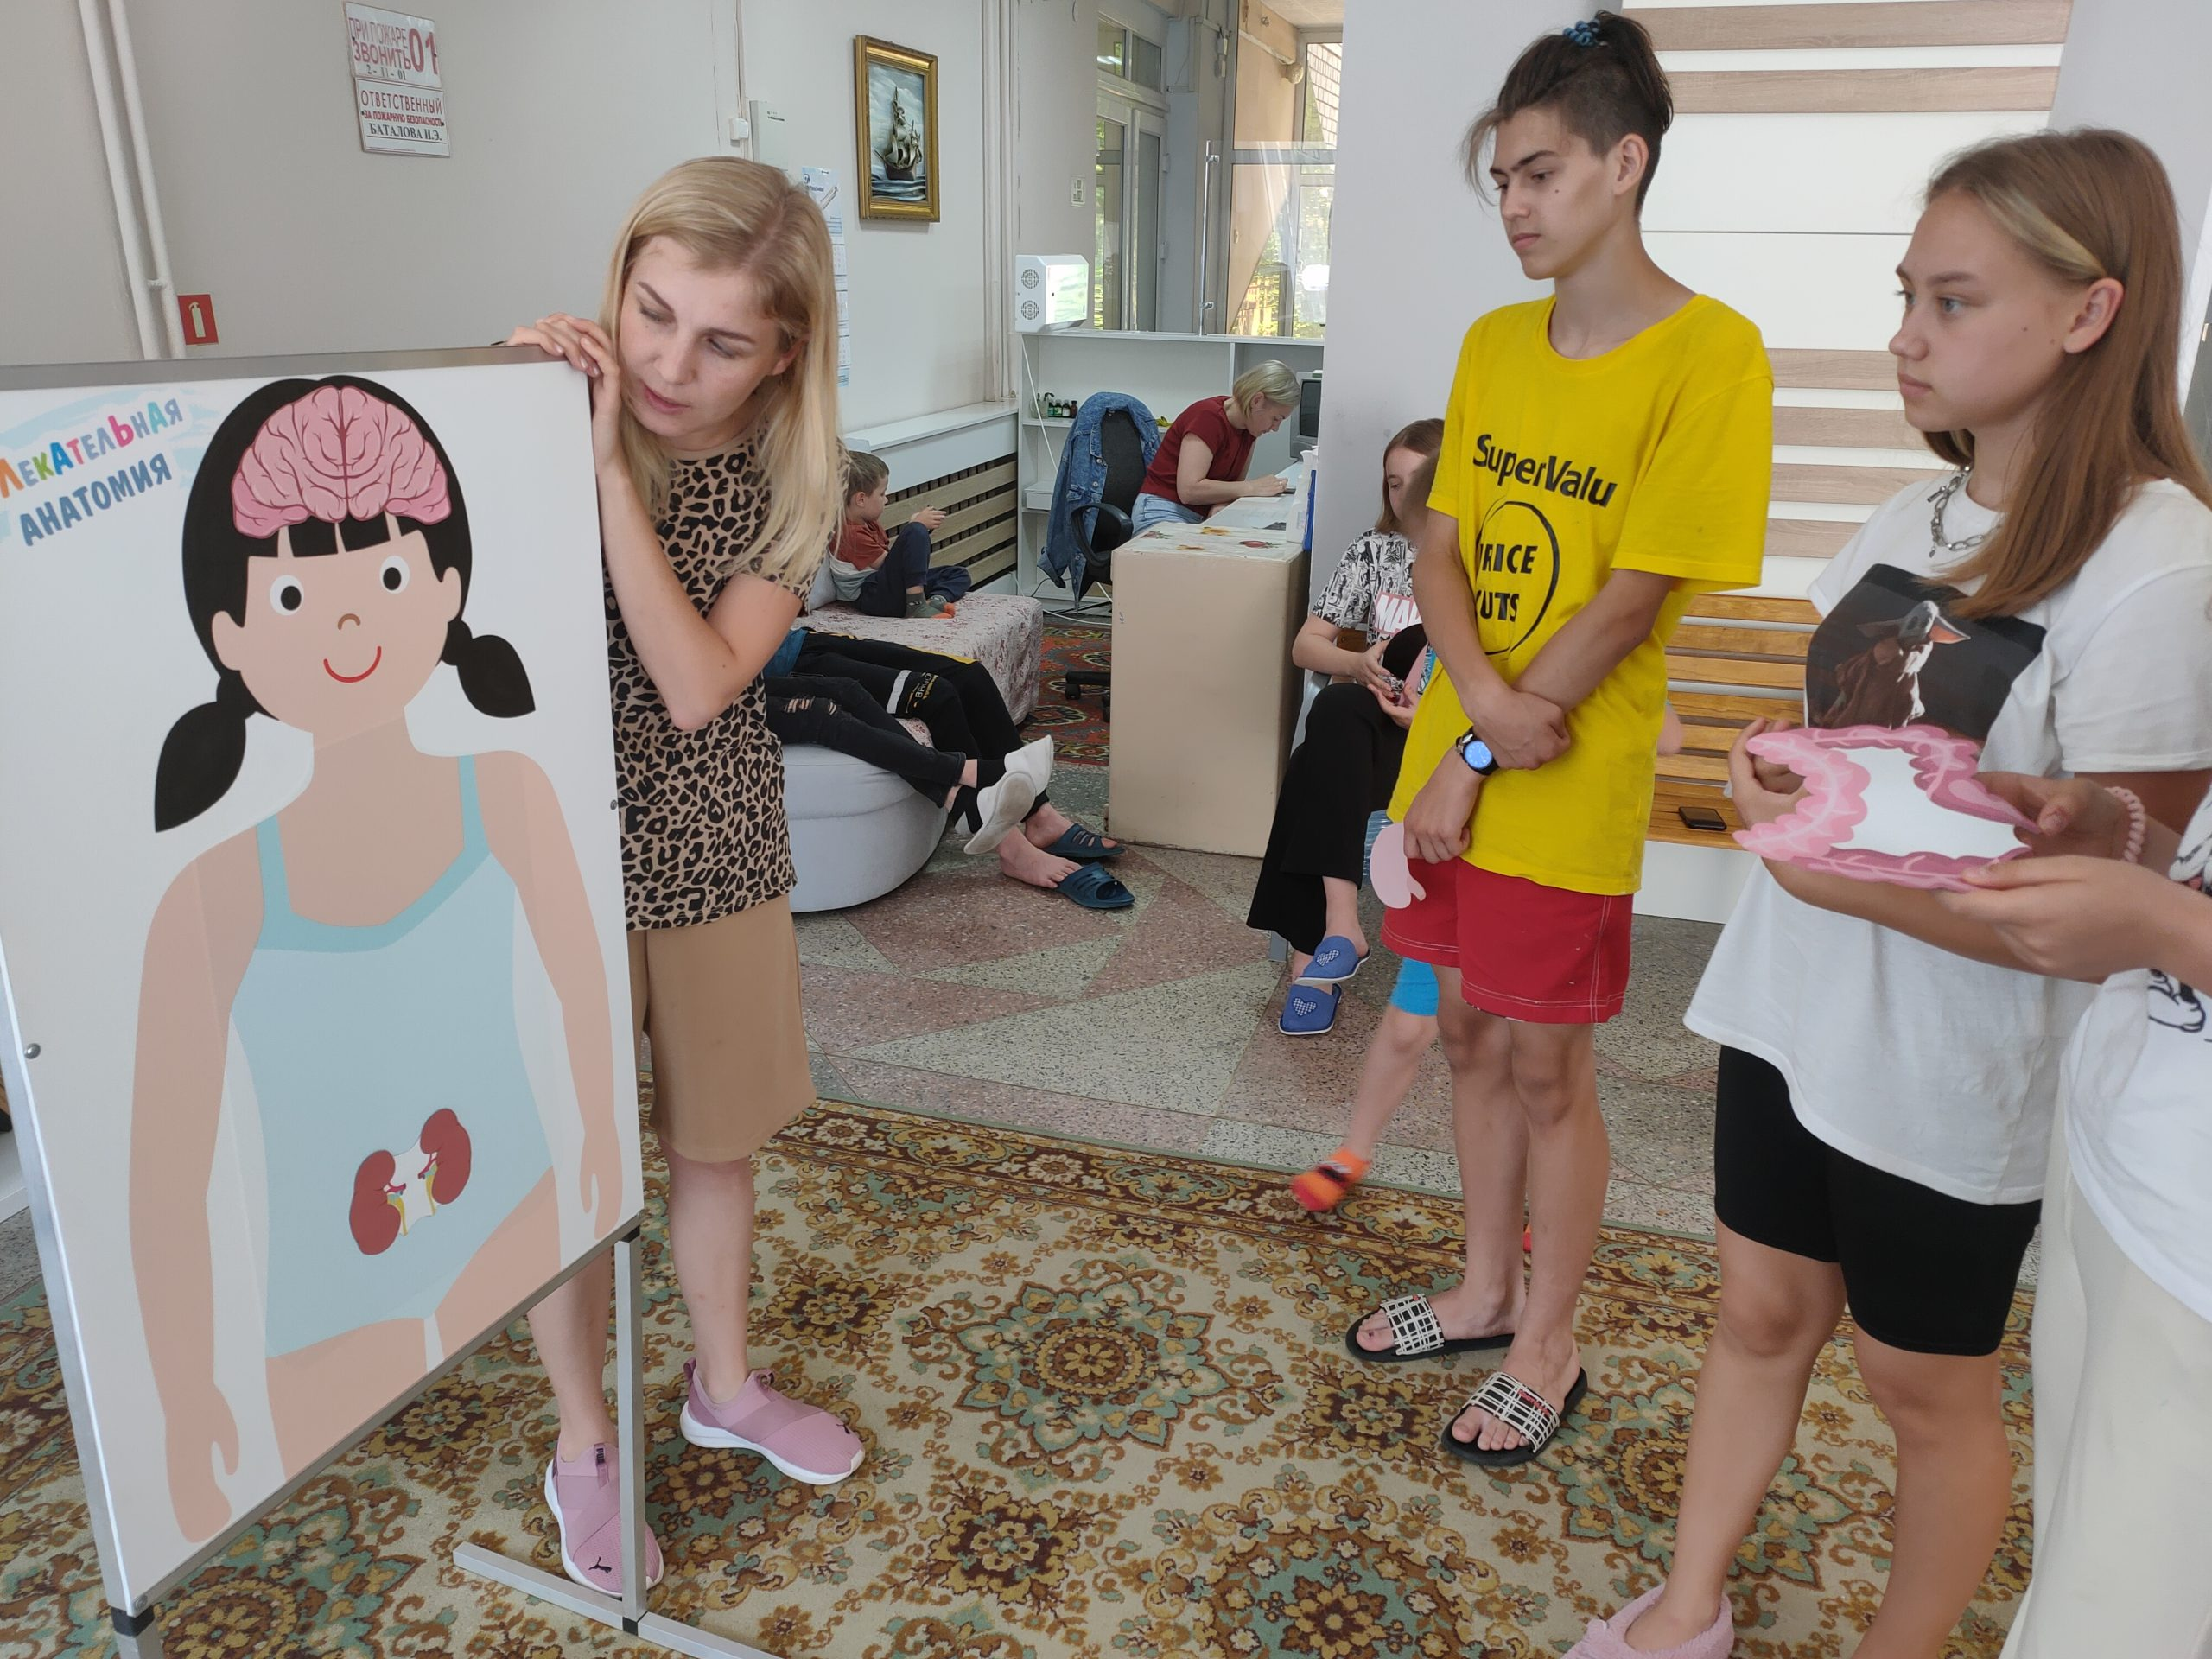 APOTHEKER HELFEN e.V. finanziert Kuraufenthalt für Diabetes-Kinder